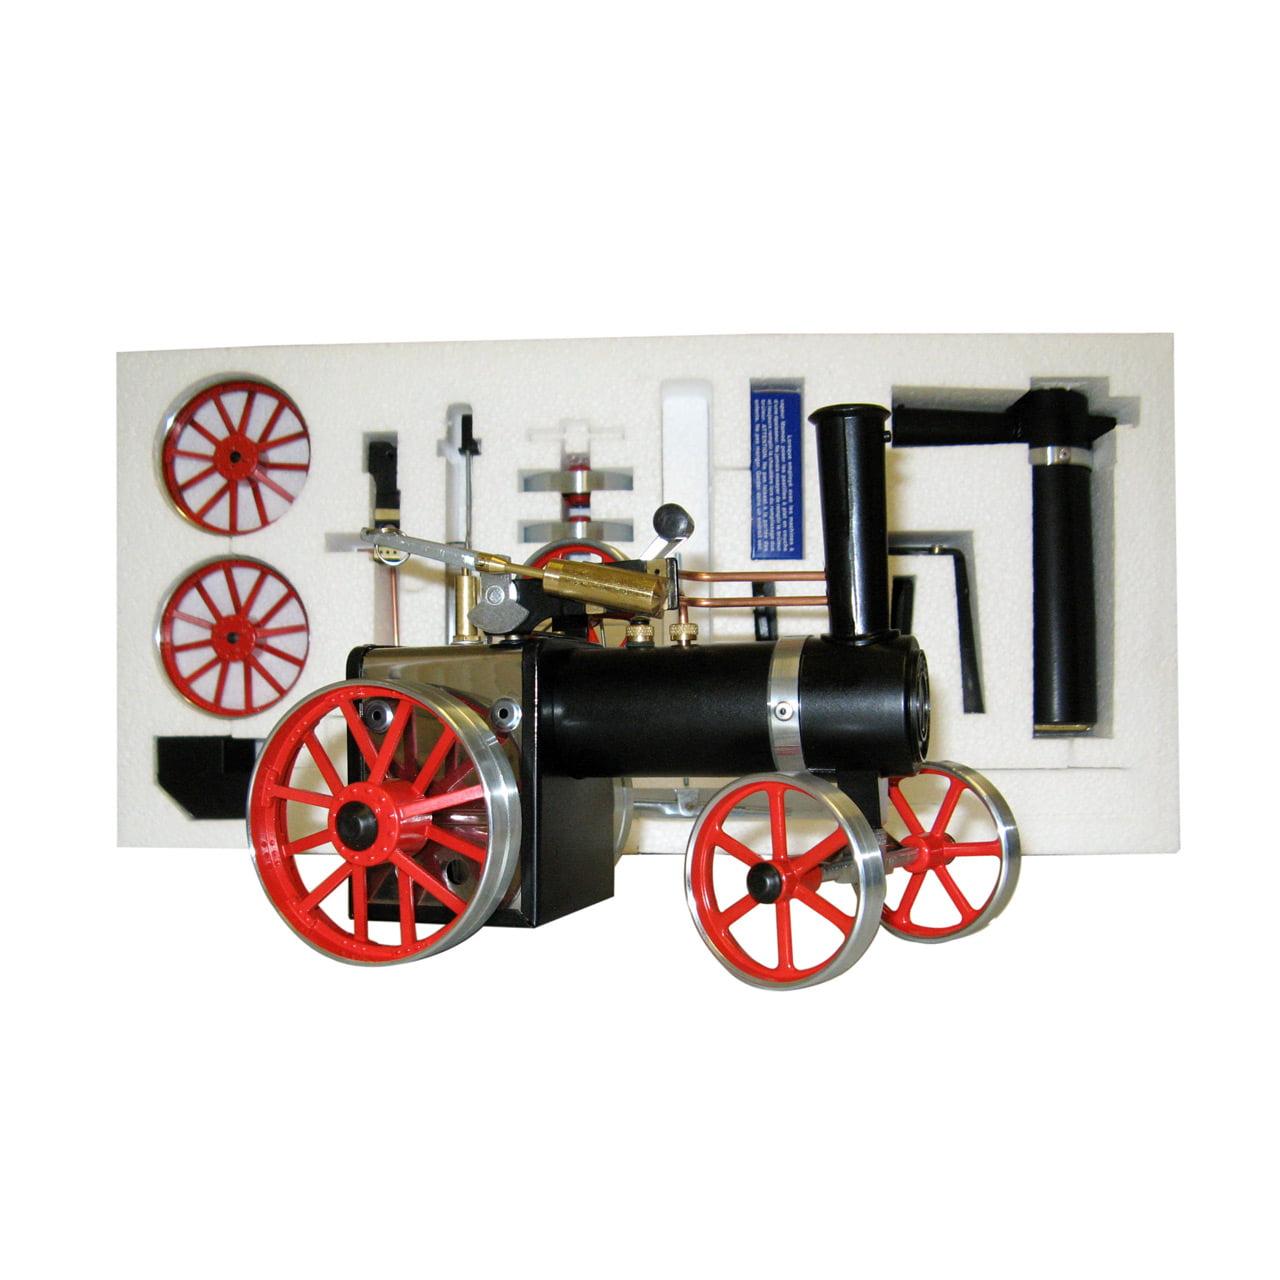 Model Steam Engine Category: model steam engine